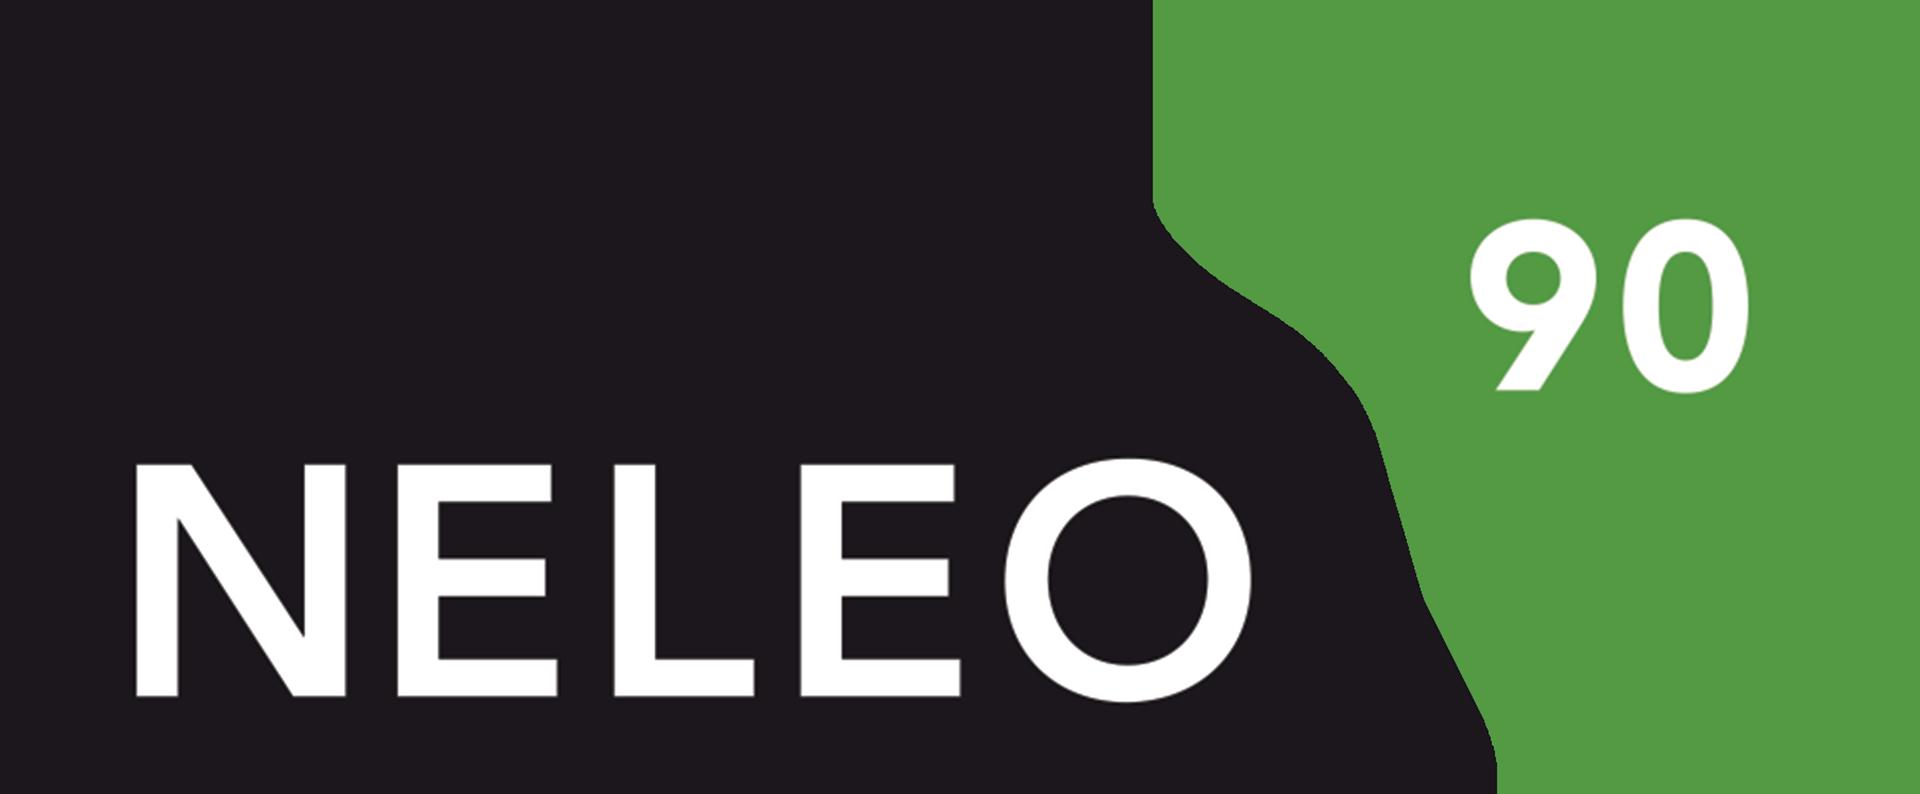 Neleo 90 Logo